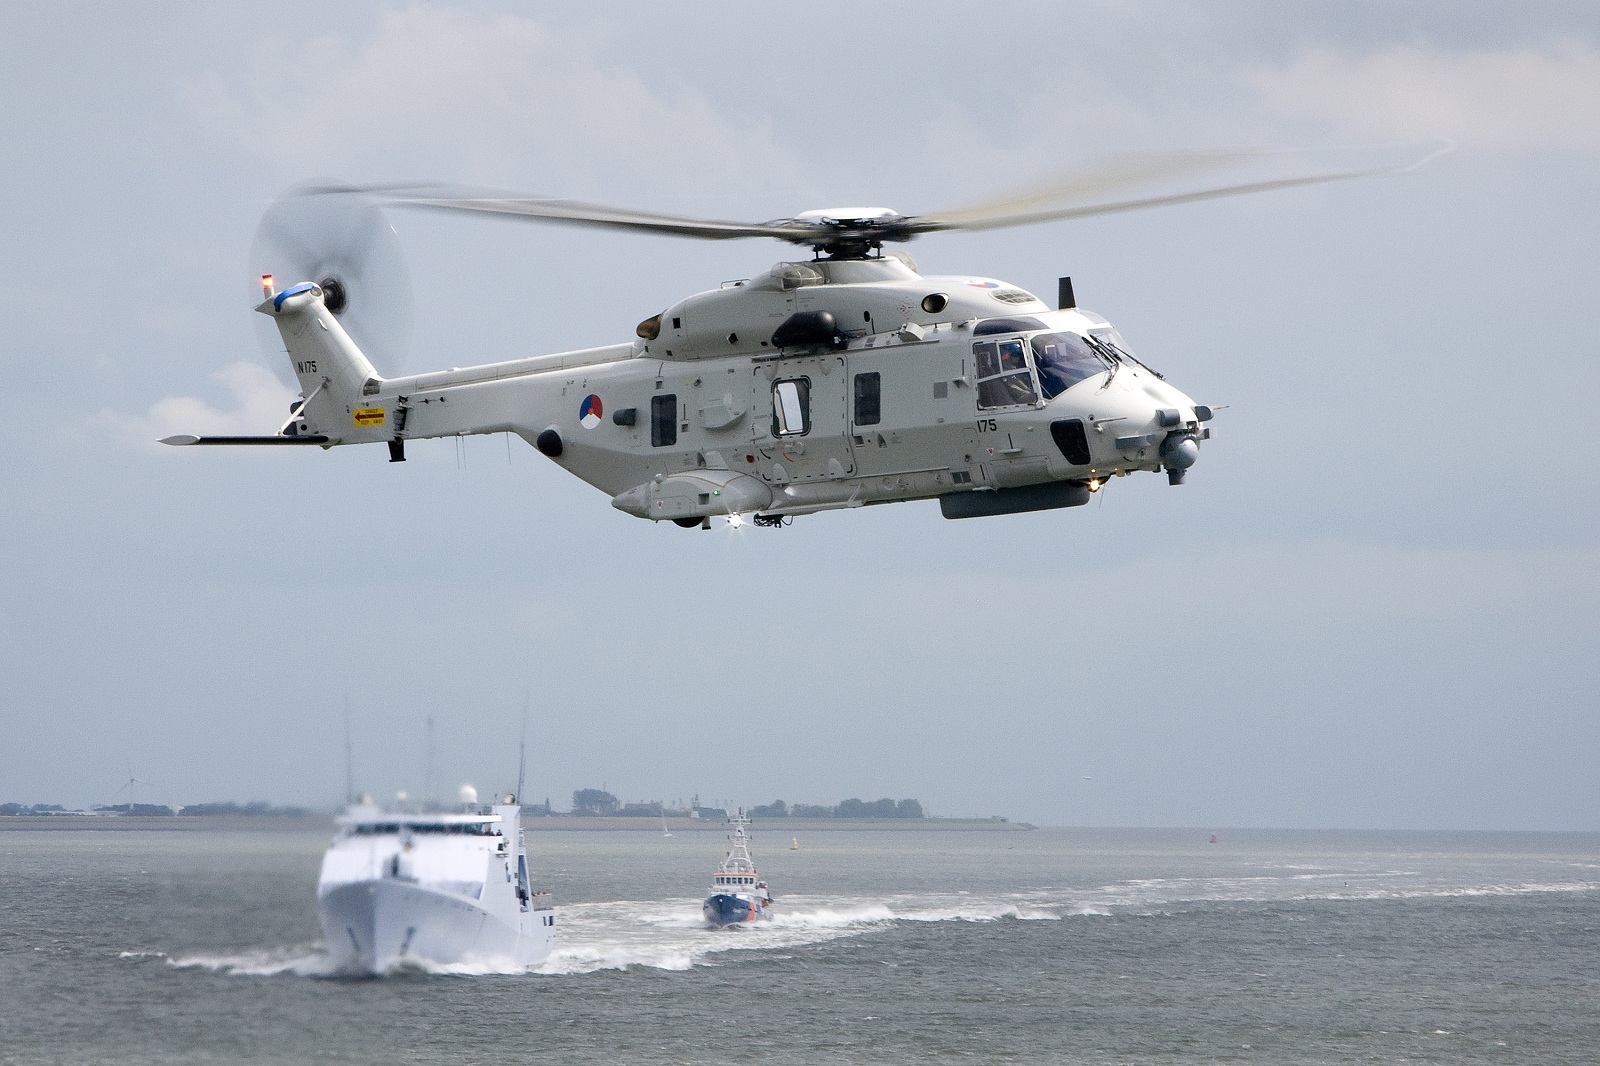 Elicottero Nh90 : Naval open source intelligence royal netherlands navy